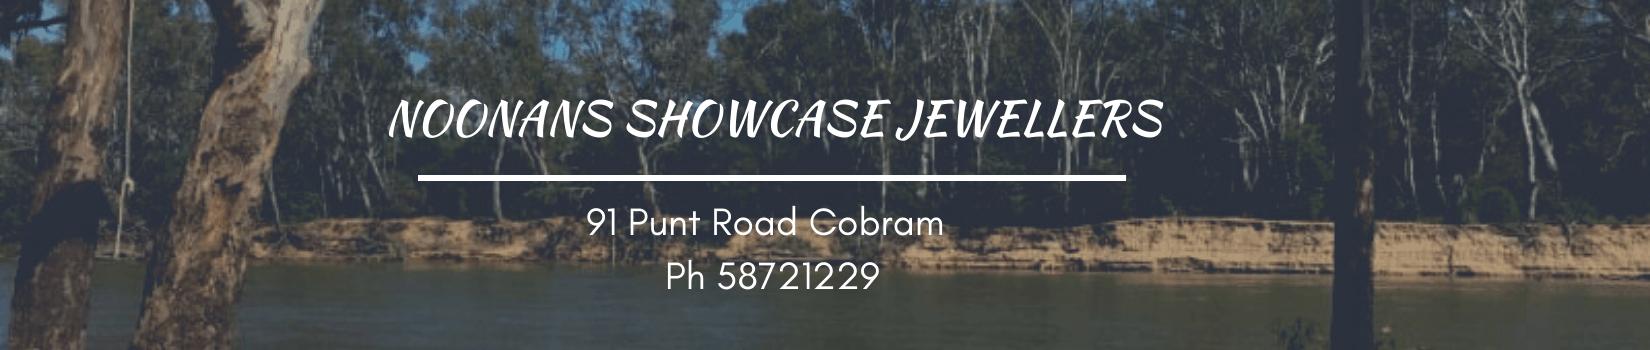 Noonans Showcase Jewellers